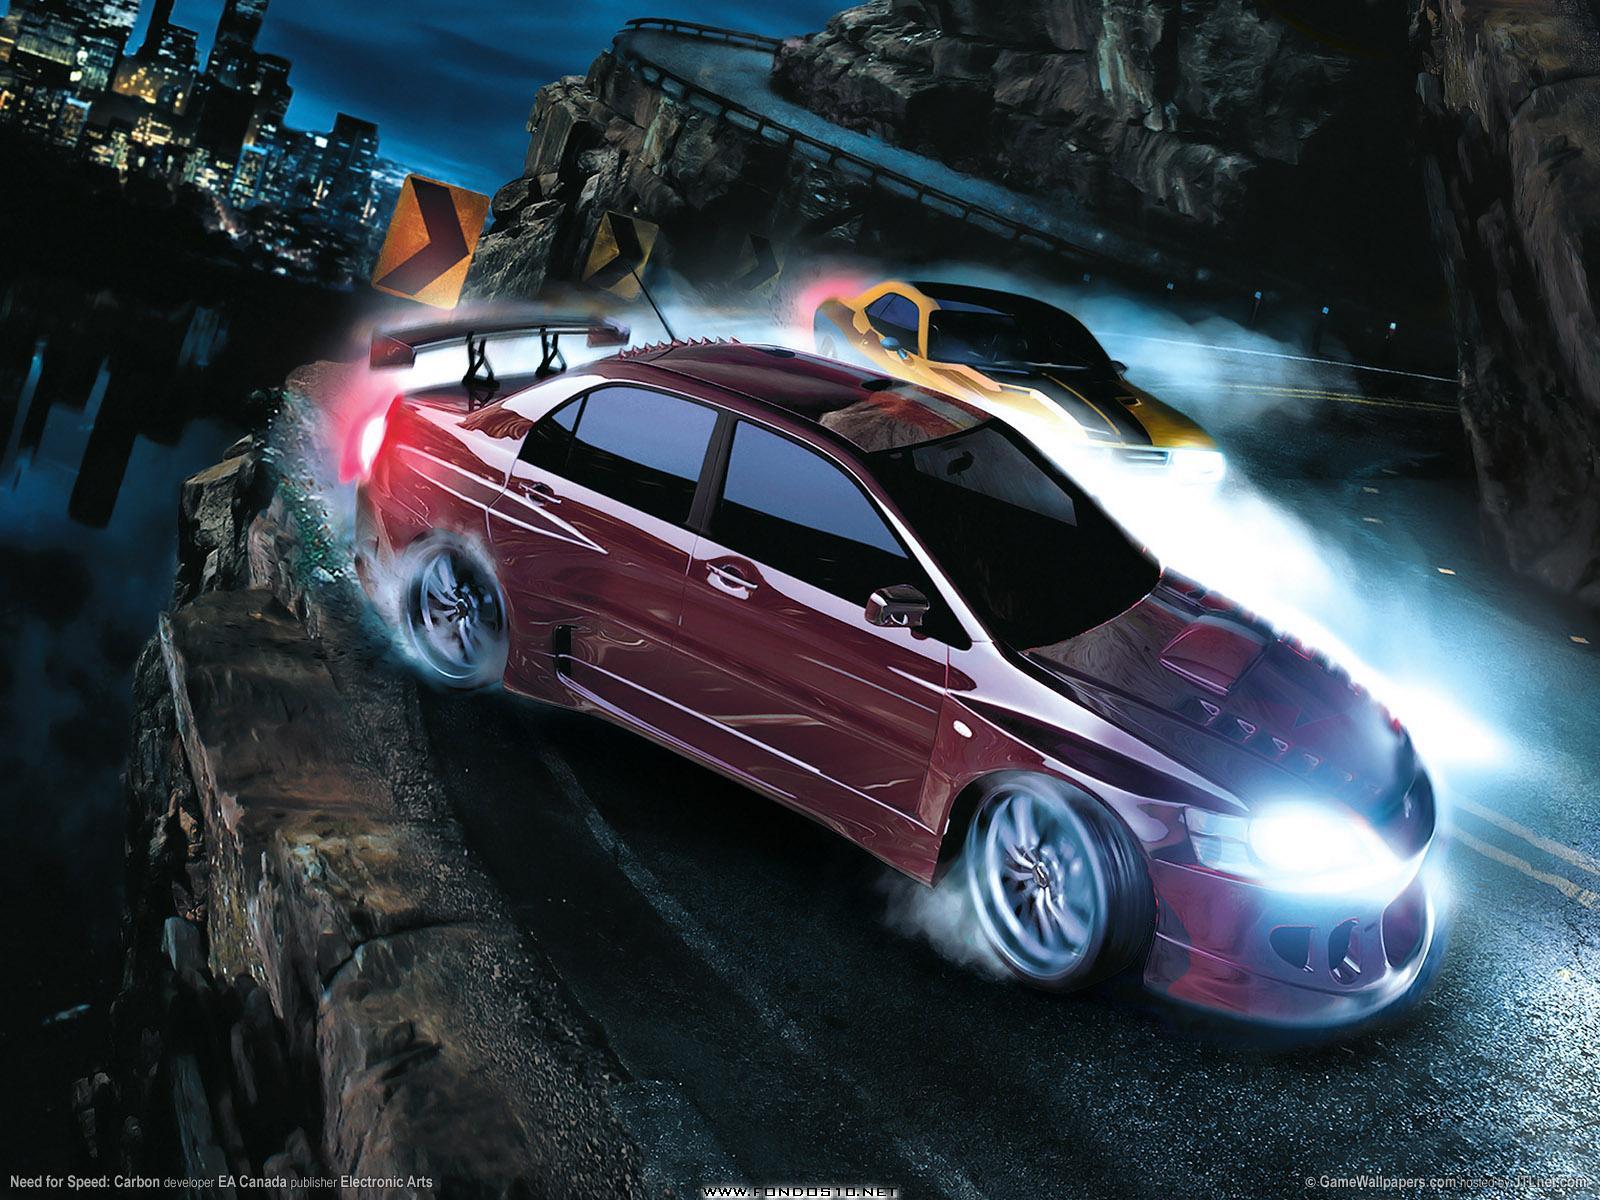 http://3.bp.blogspot.com/-Bafgf2khSiA/UU_D2YxJ1BI/AAAAAAAA8Yc/RGry9CGhfUY/s1600/need_for_speed_carbon_1600x1200_www.fondos10.net.jpg